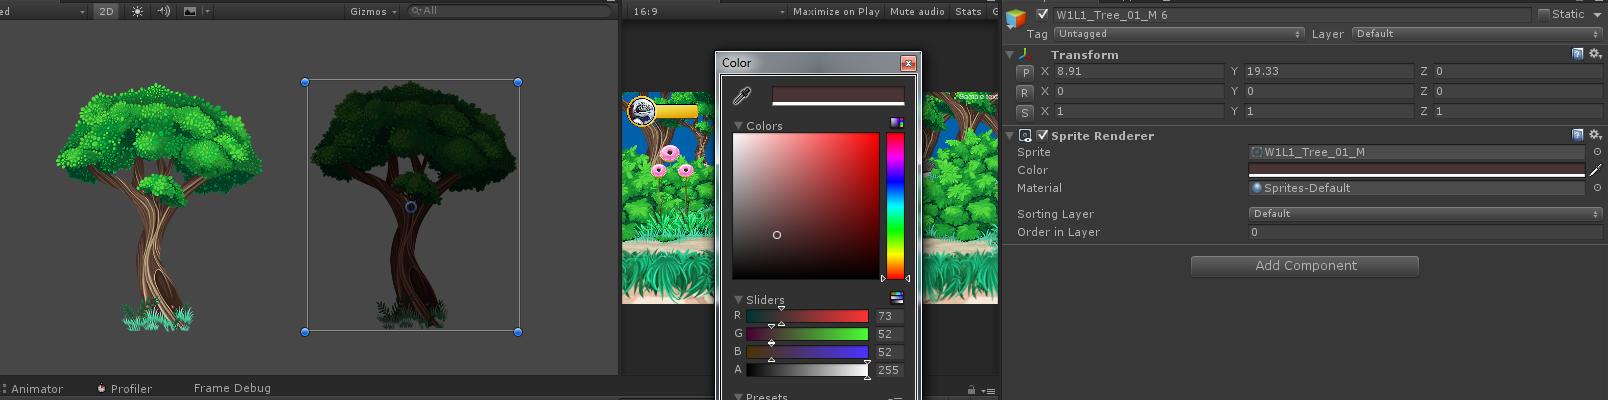 SpriteColor.jpg